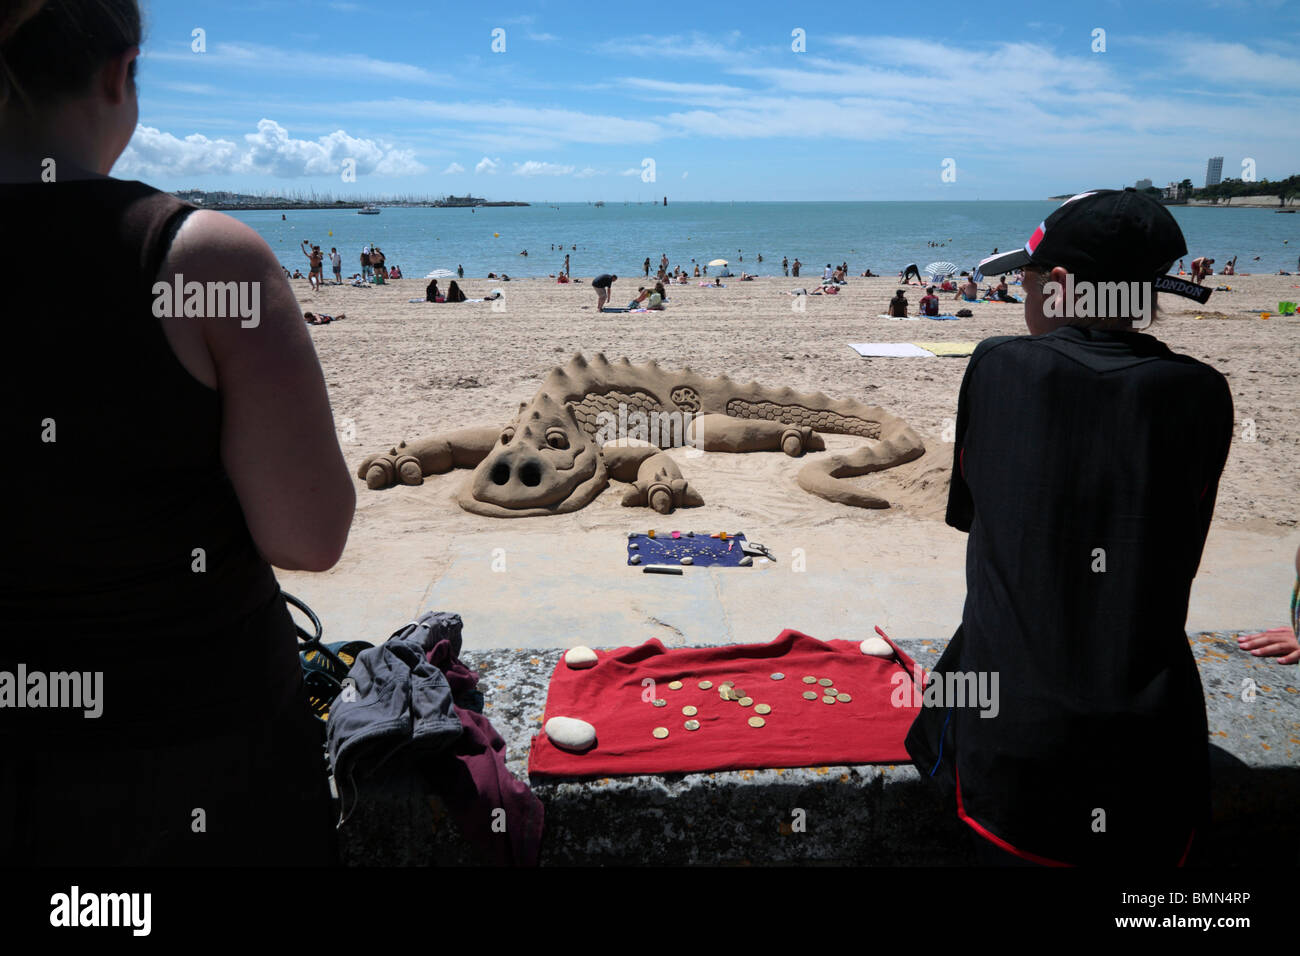 Sand sculpture of a Crocodile on the  Plage de la Concurrence - Stock Image